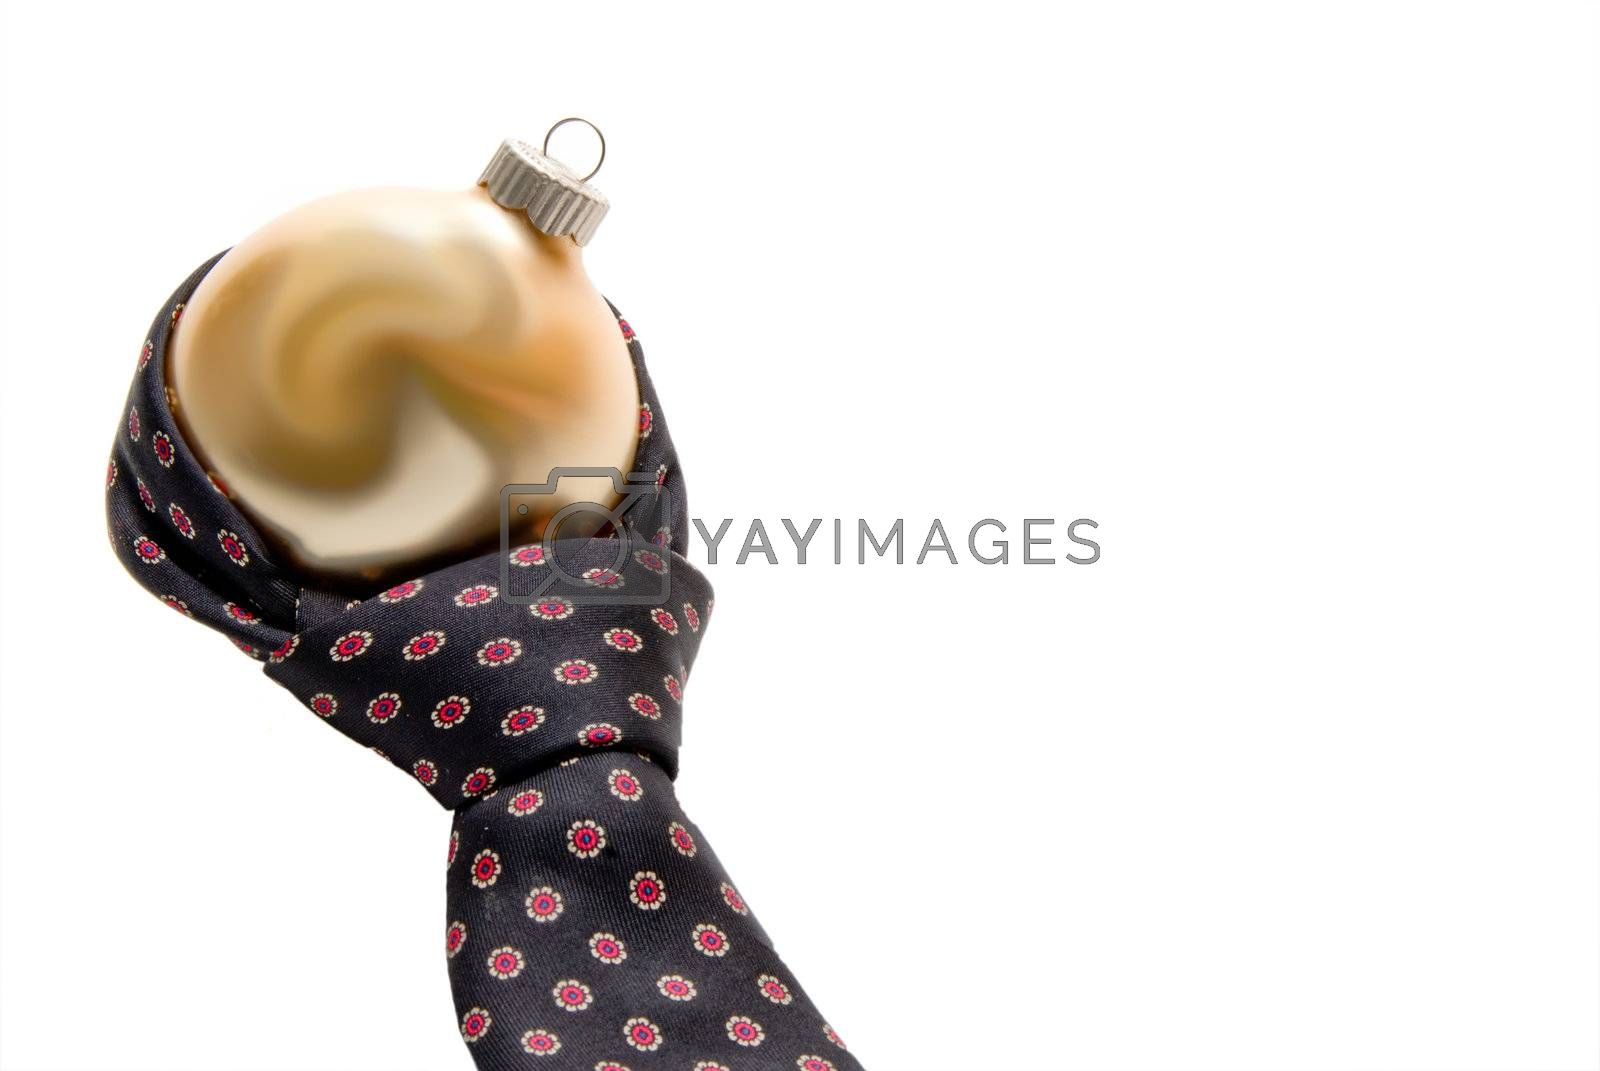 A necktie tied around a Christmas ornament.